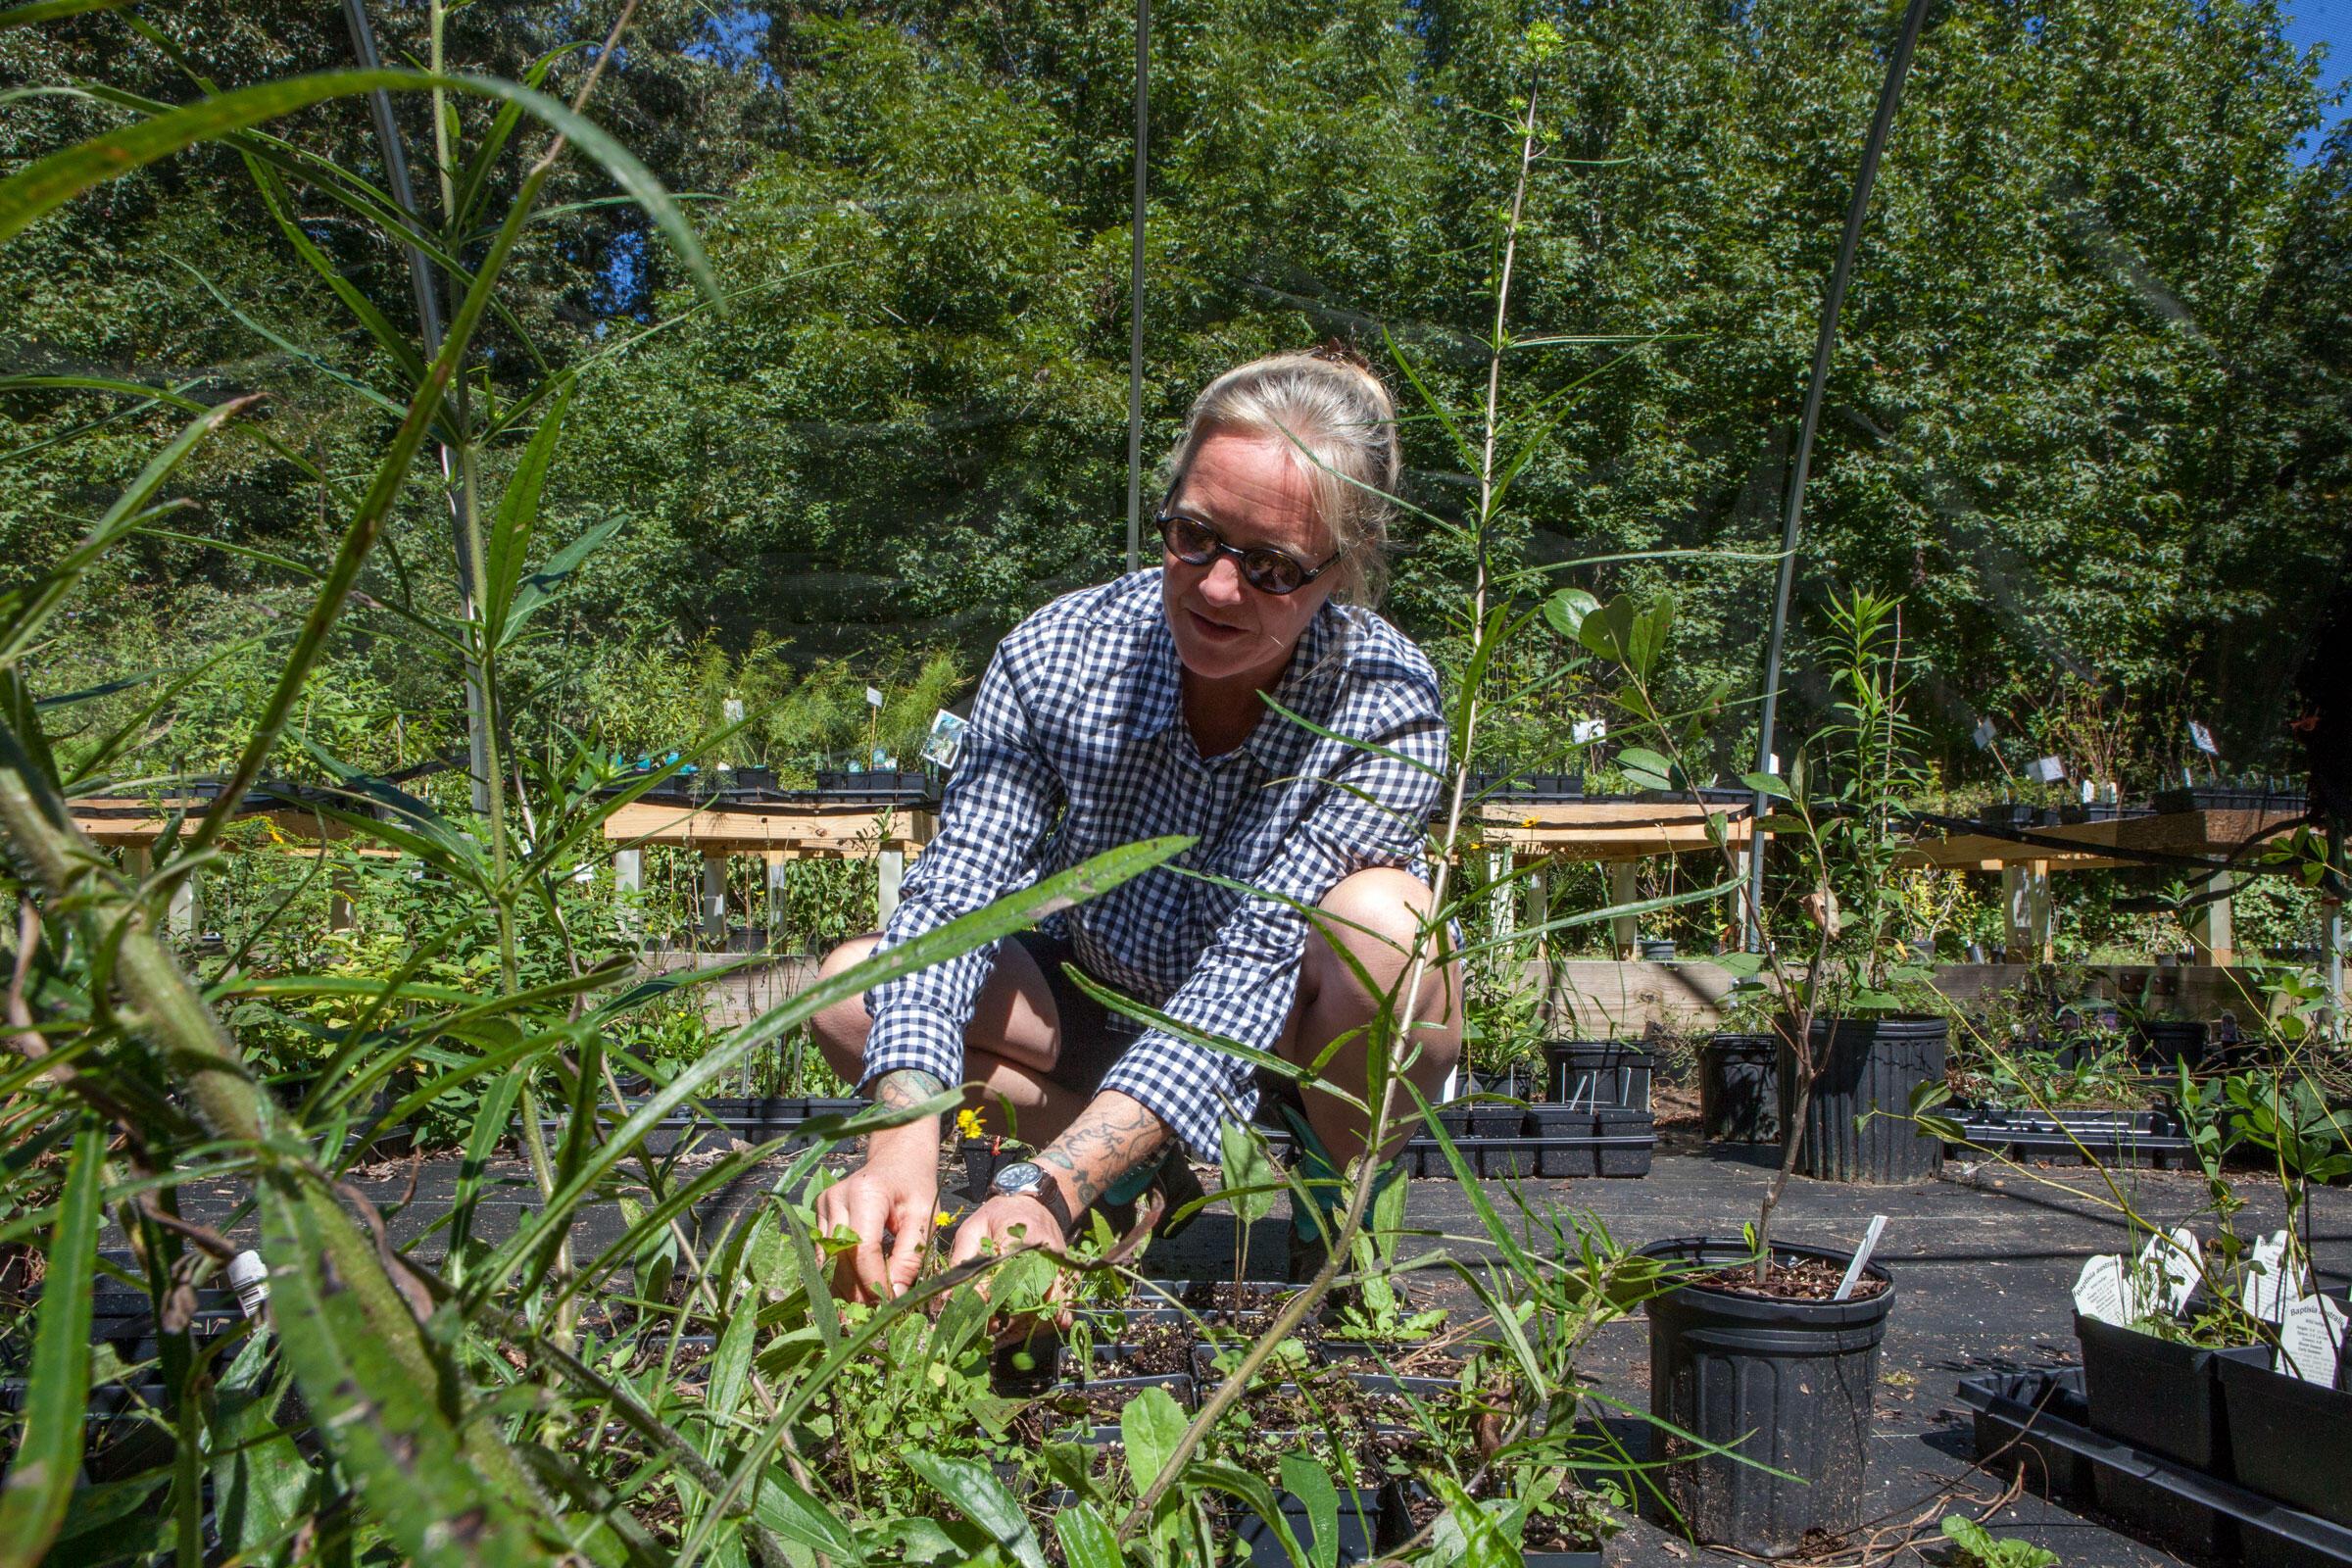 Lamberson weeding out the non-native species. Camilla Cerea/Audubon